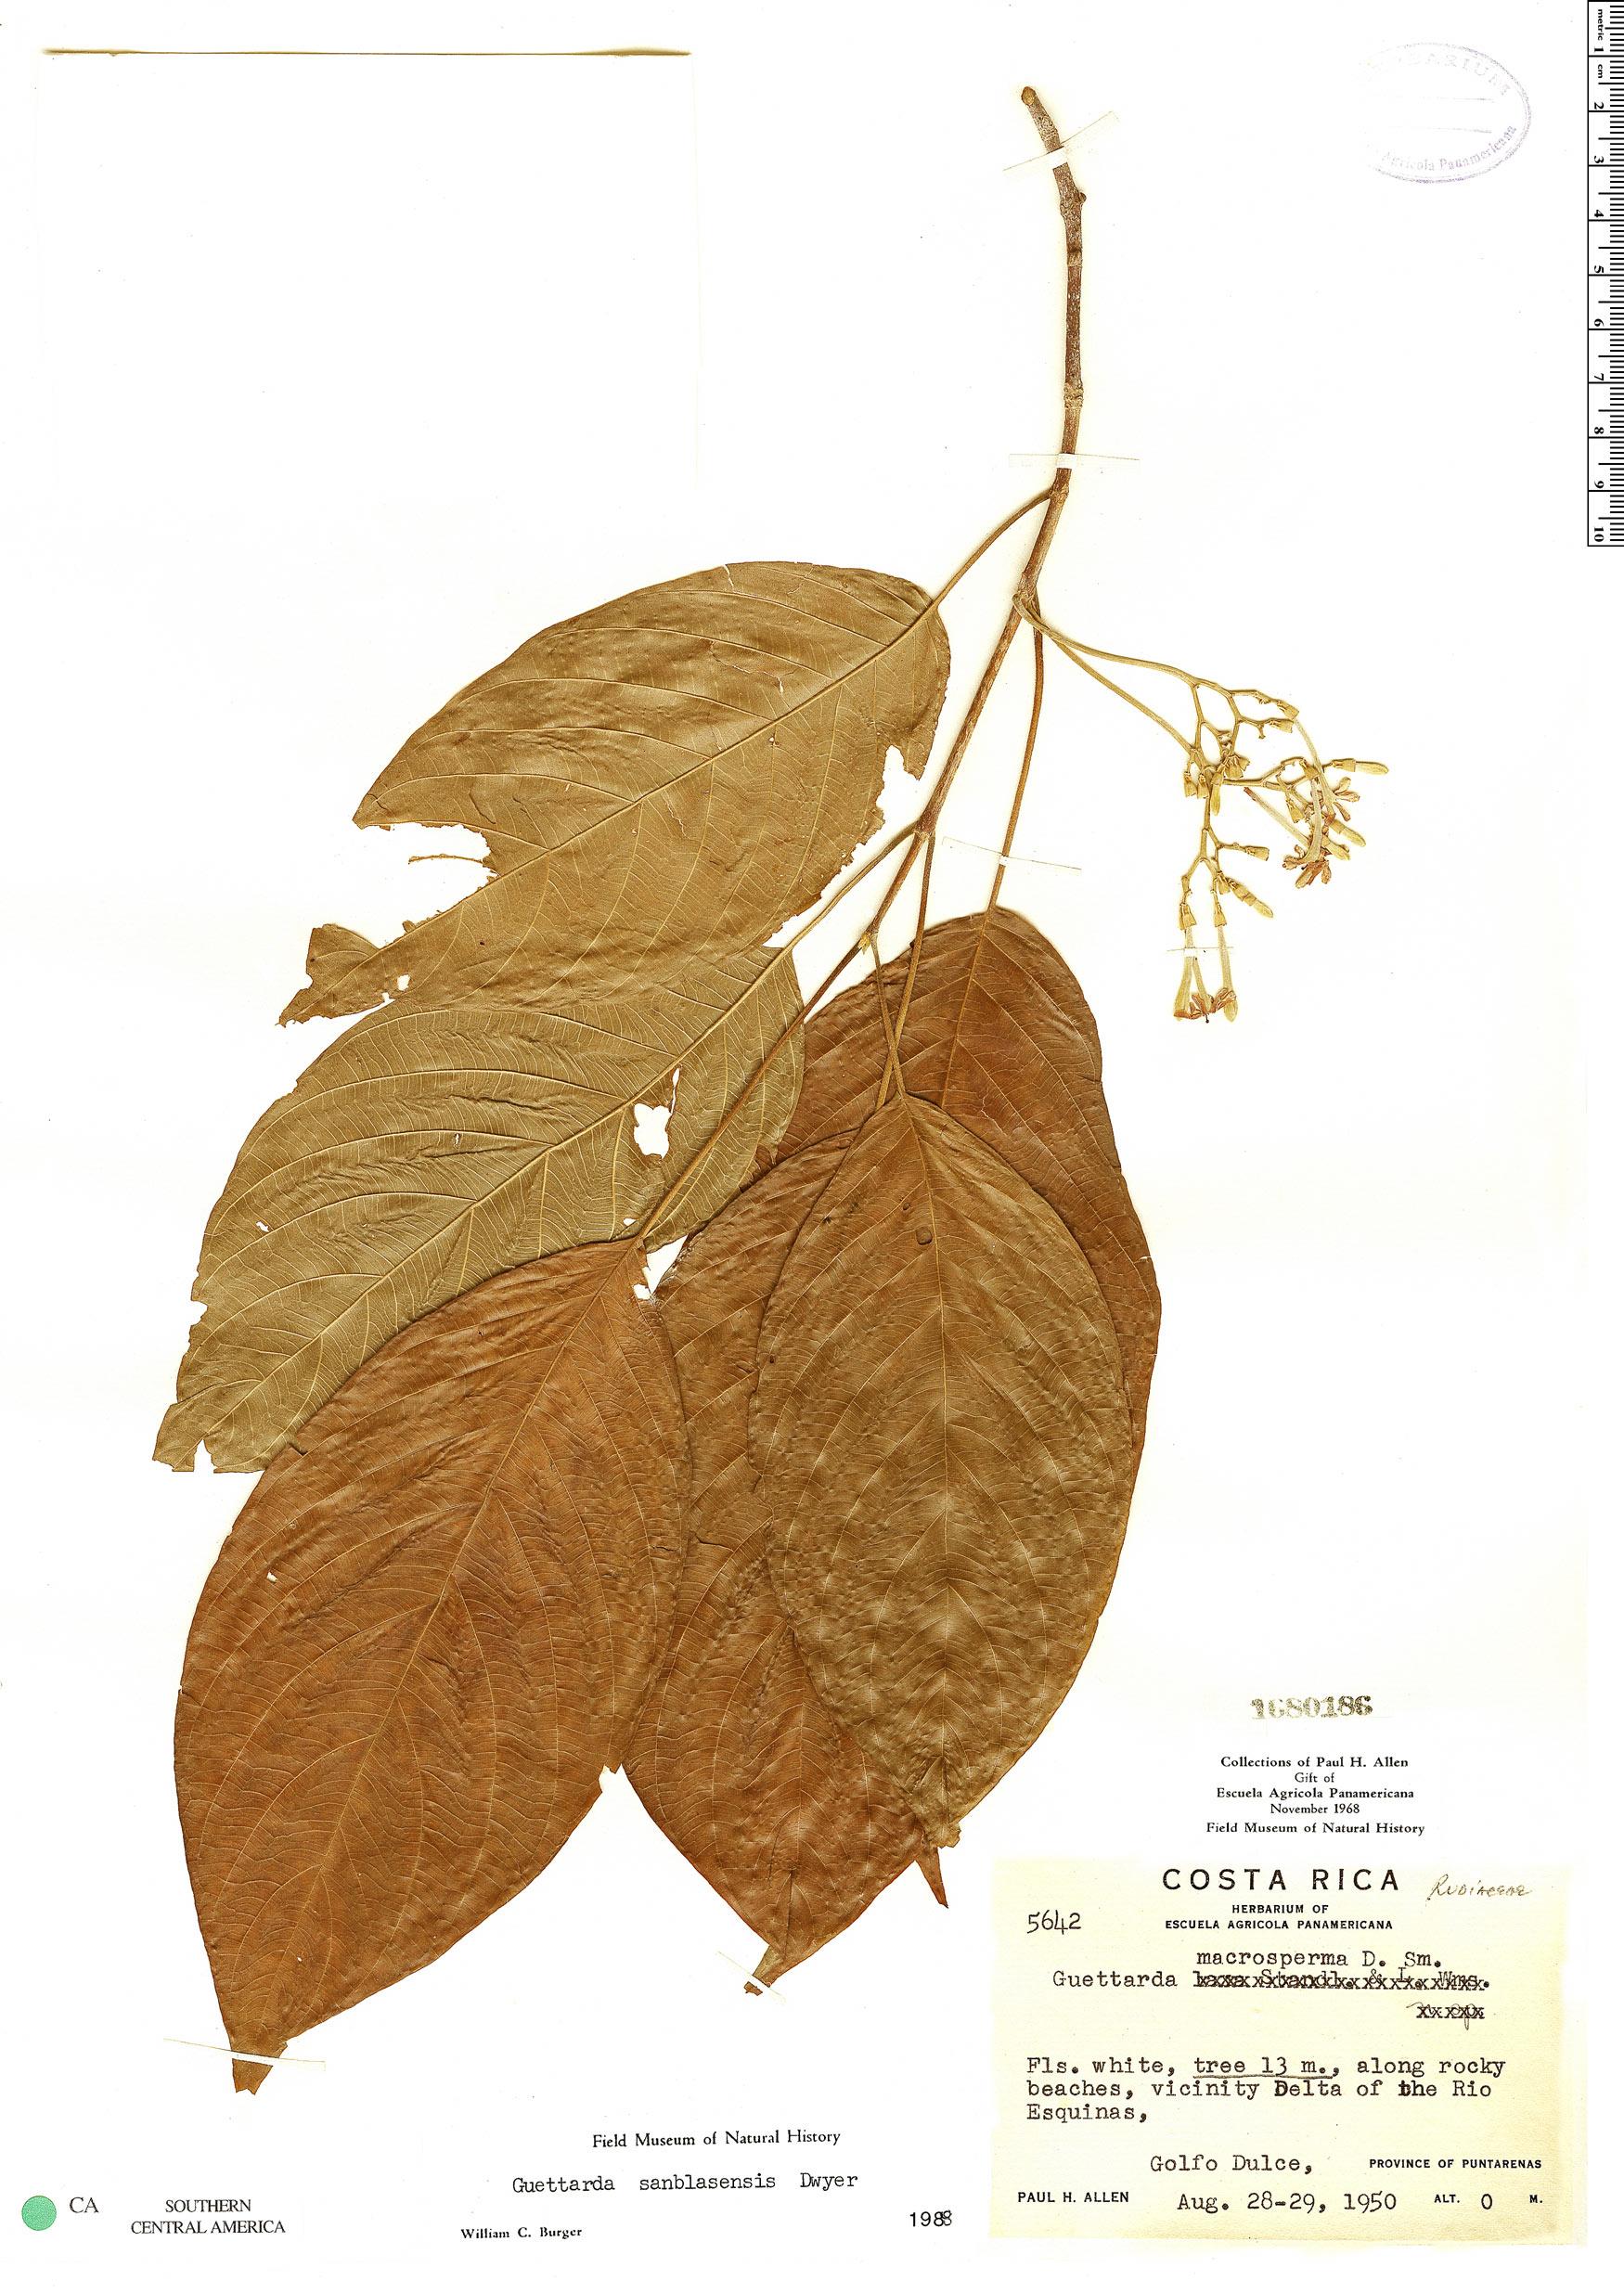 Specimen: Guettarda sanblasensis